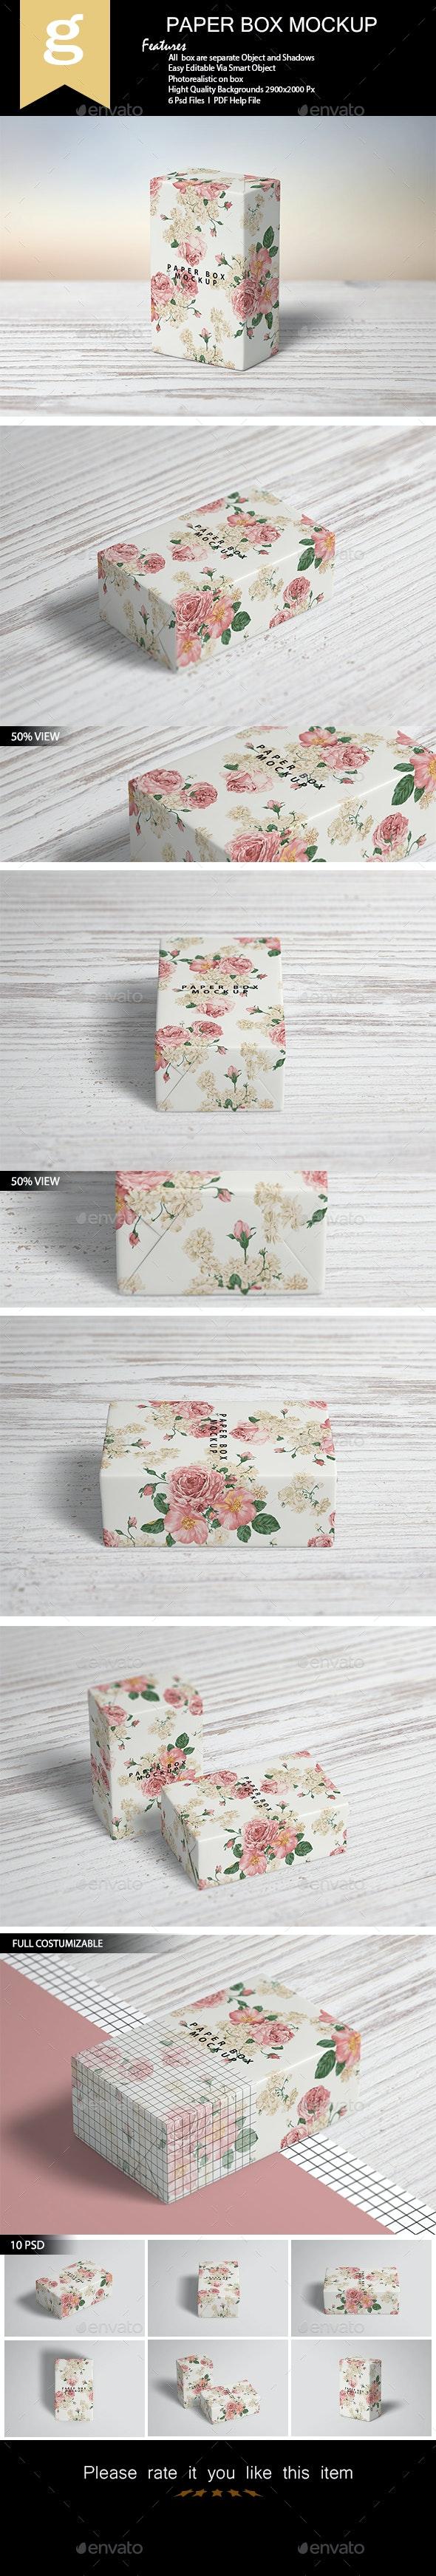 Paper Box Mock-Up - Product Mock-Ups Graphics